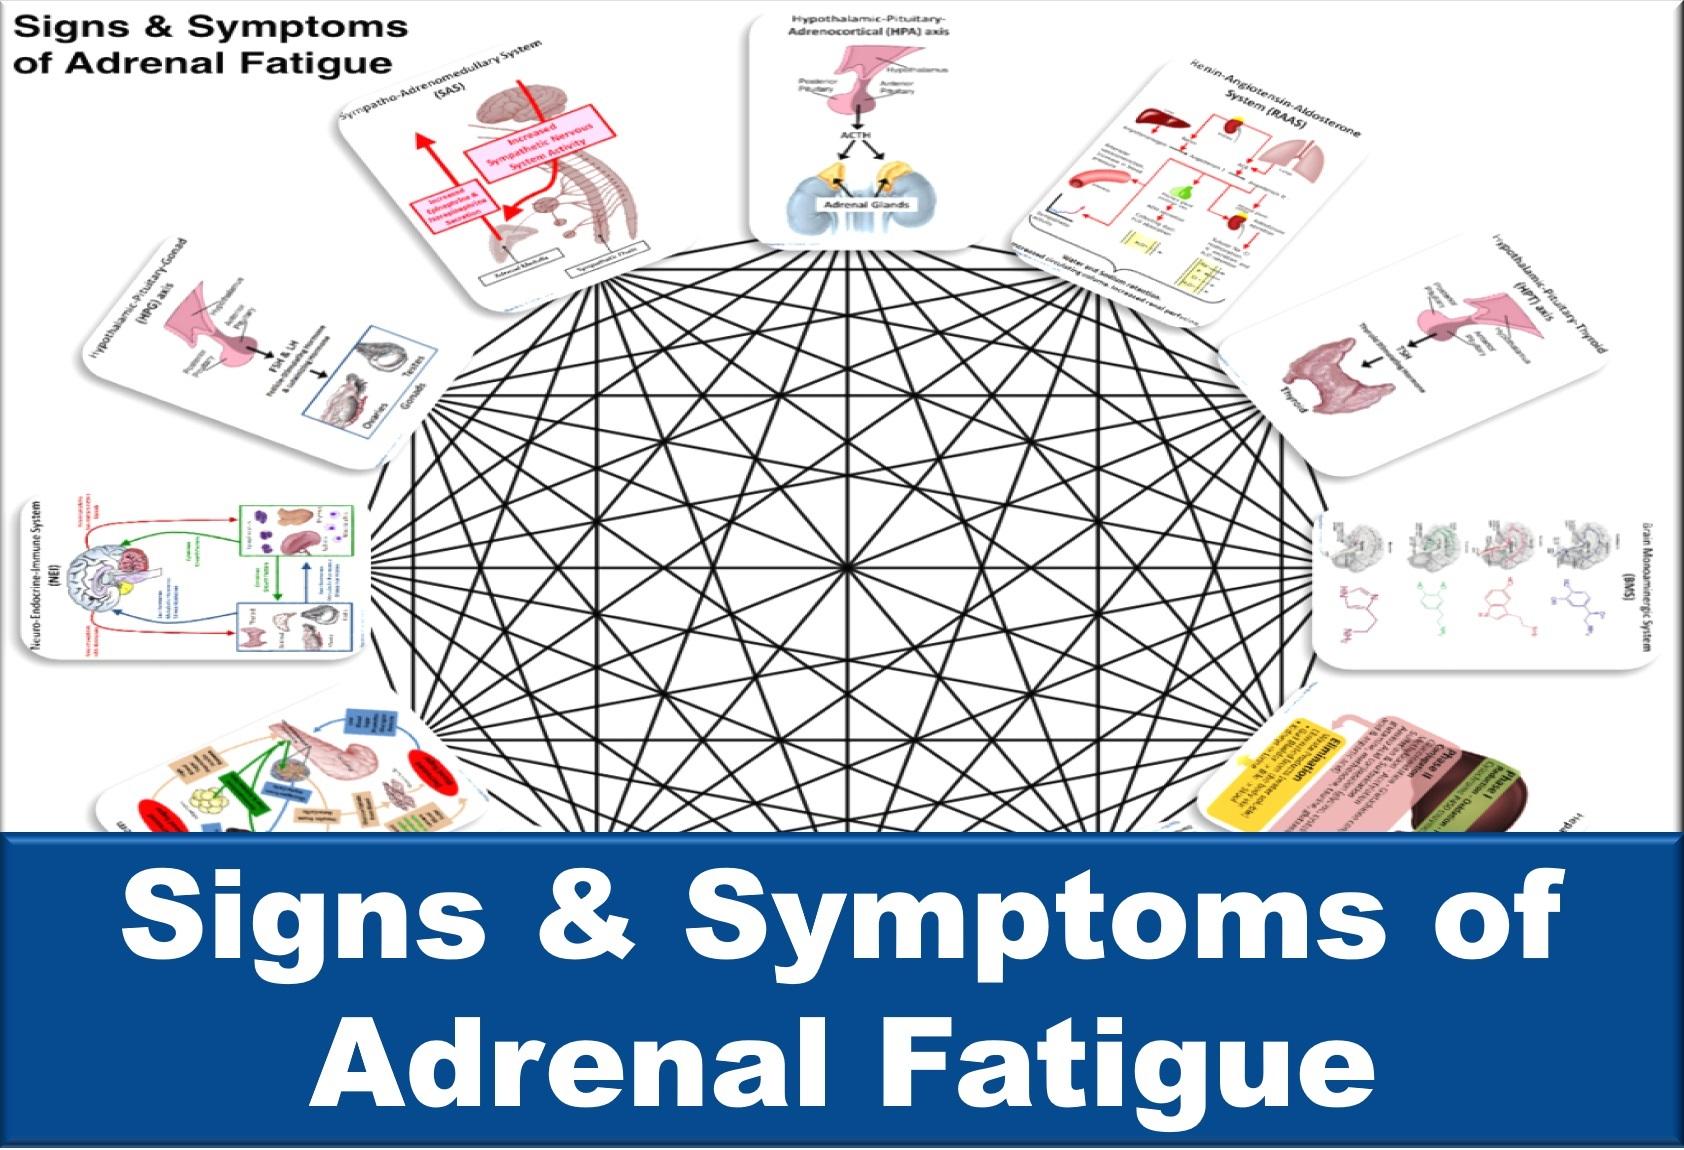 Sign & Symptoms